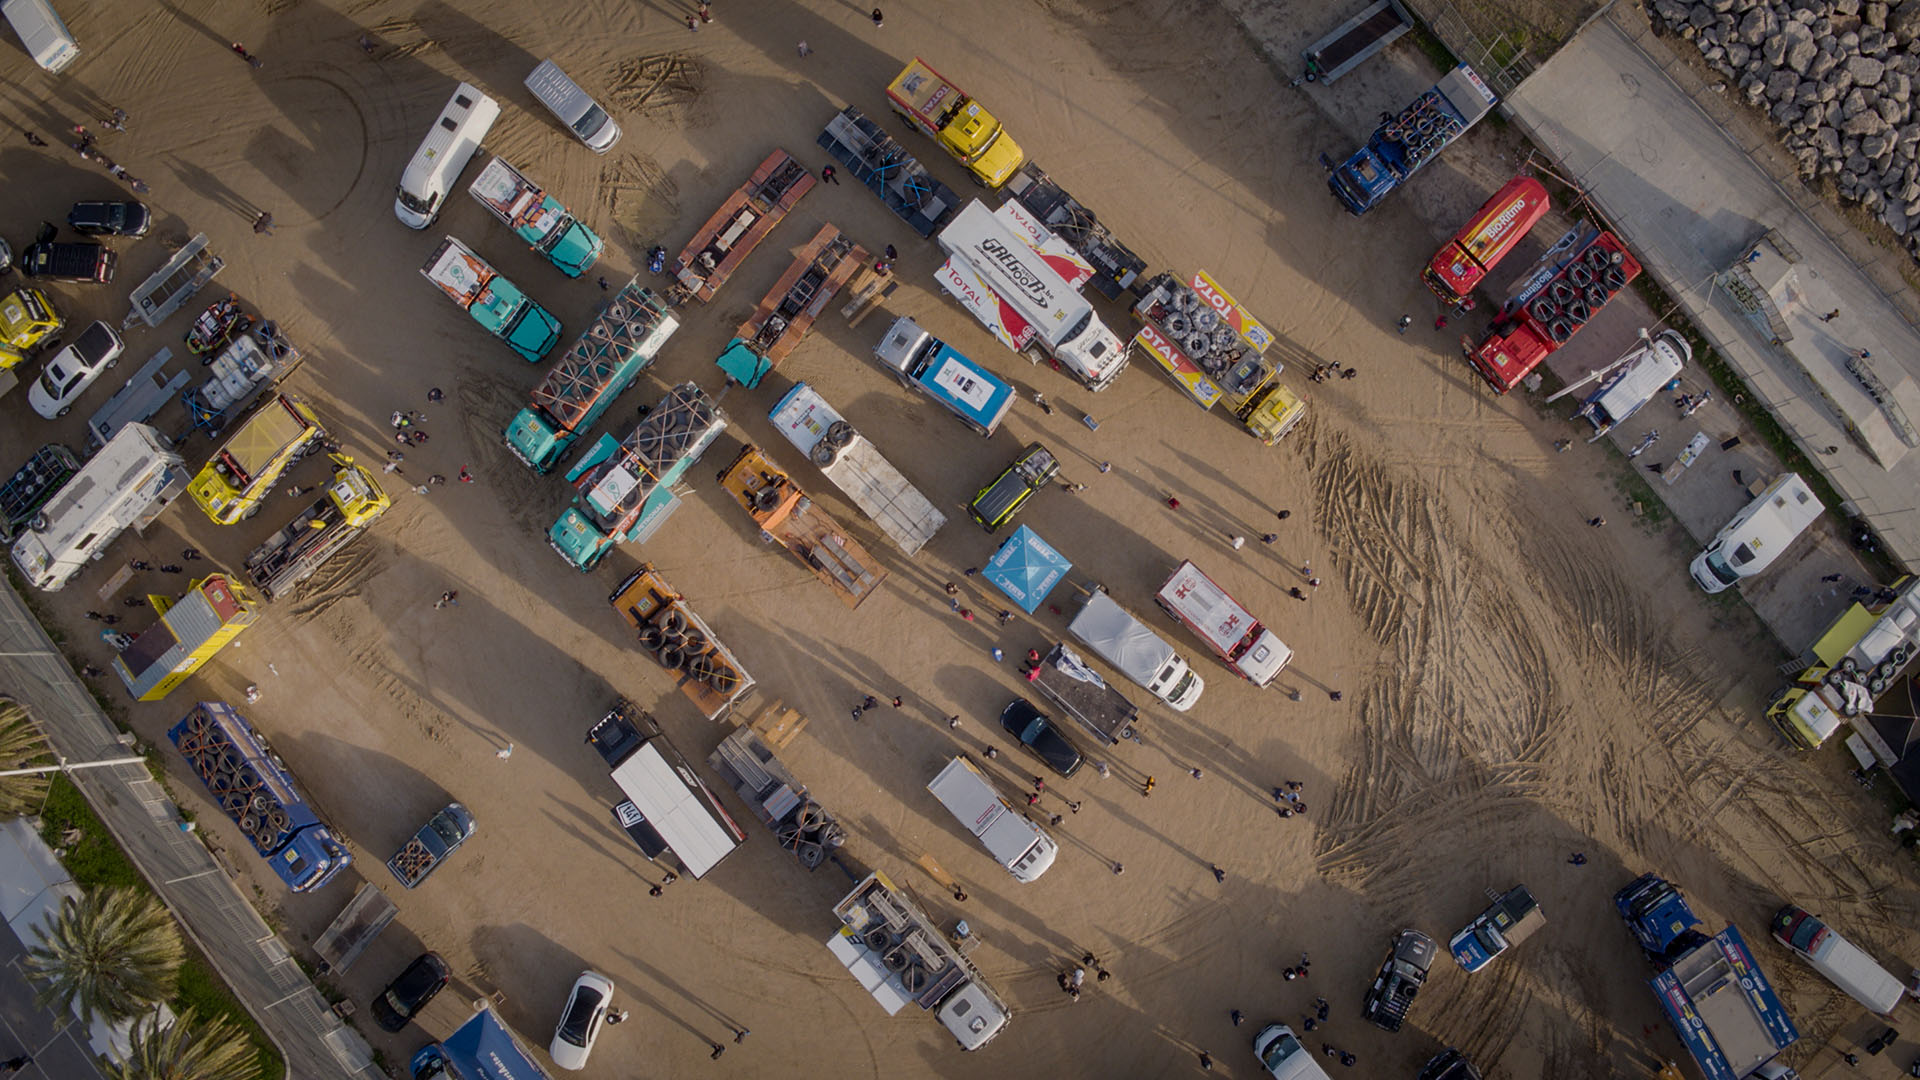 London based drone operator